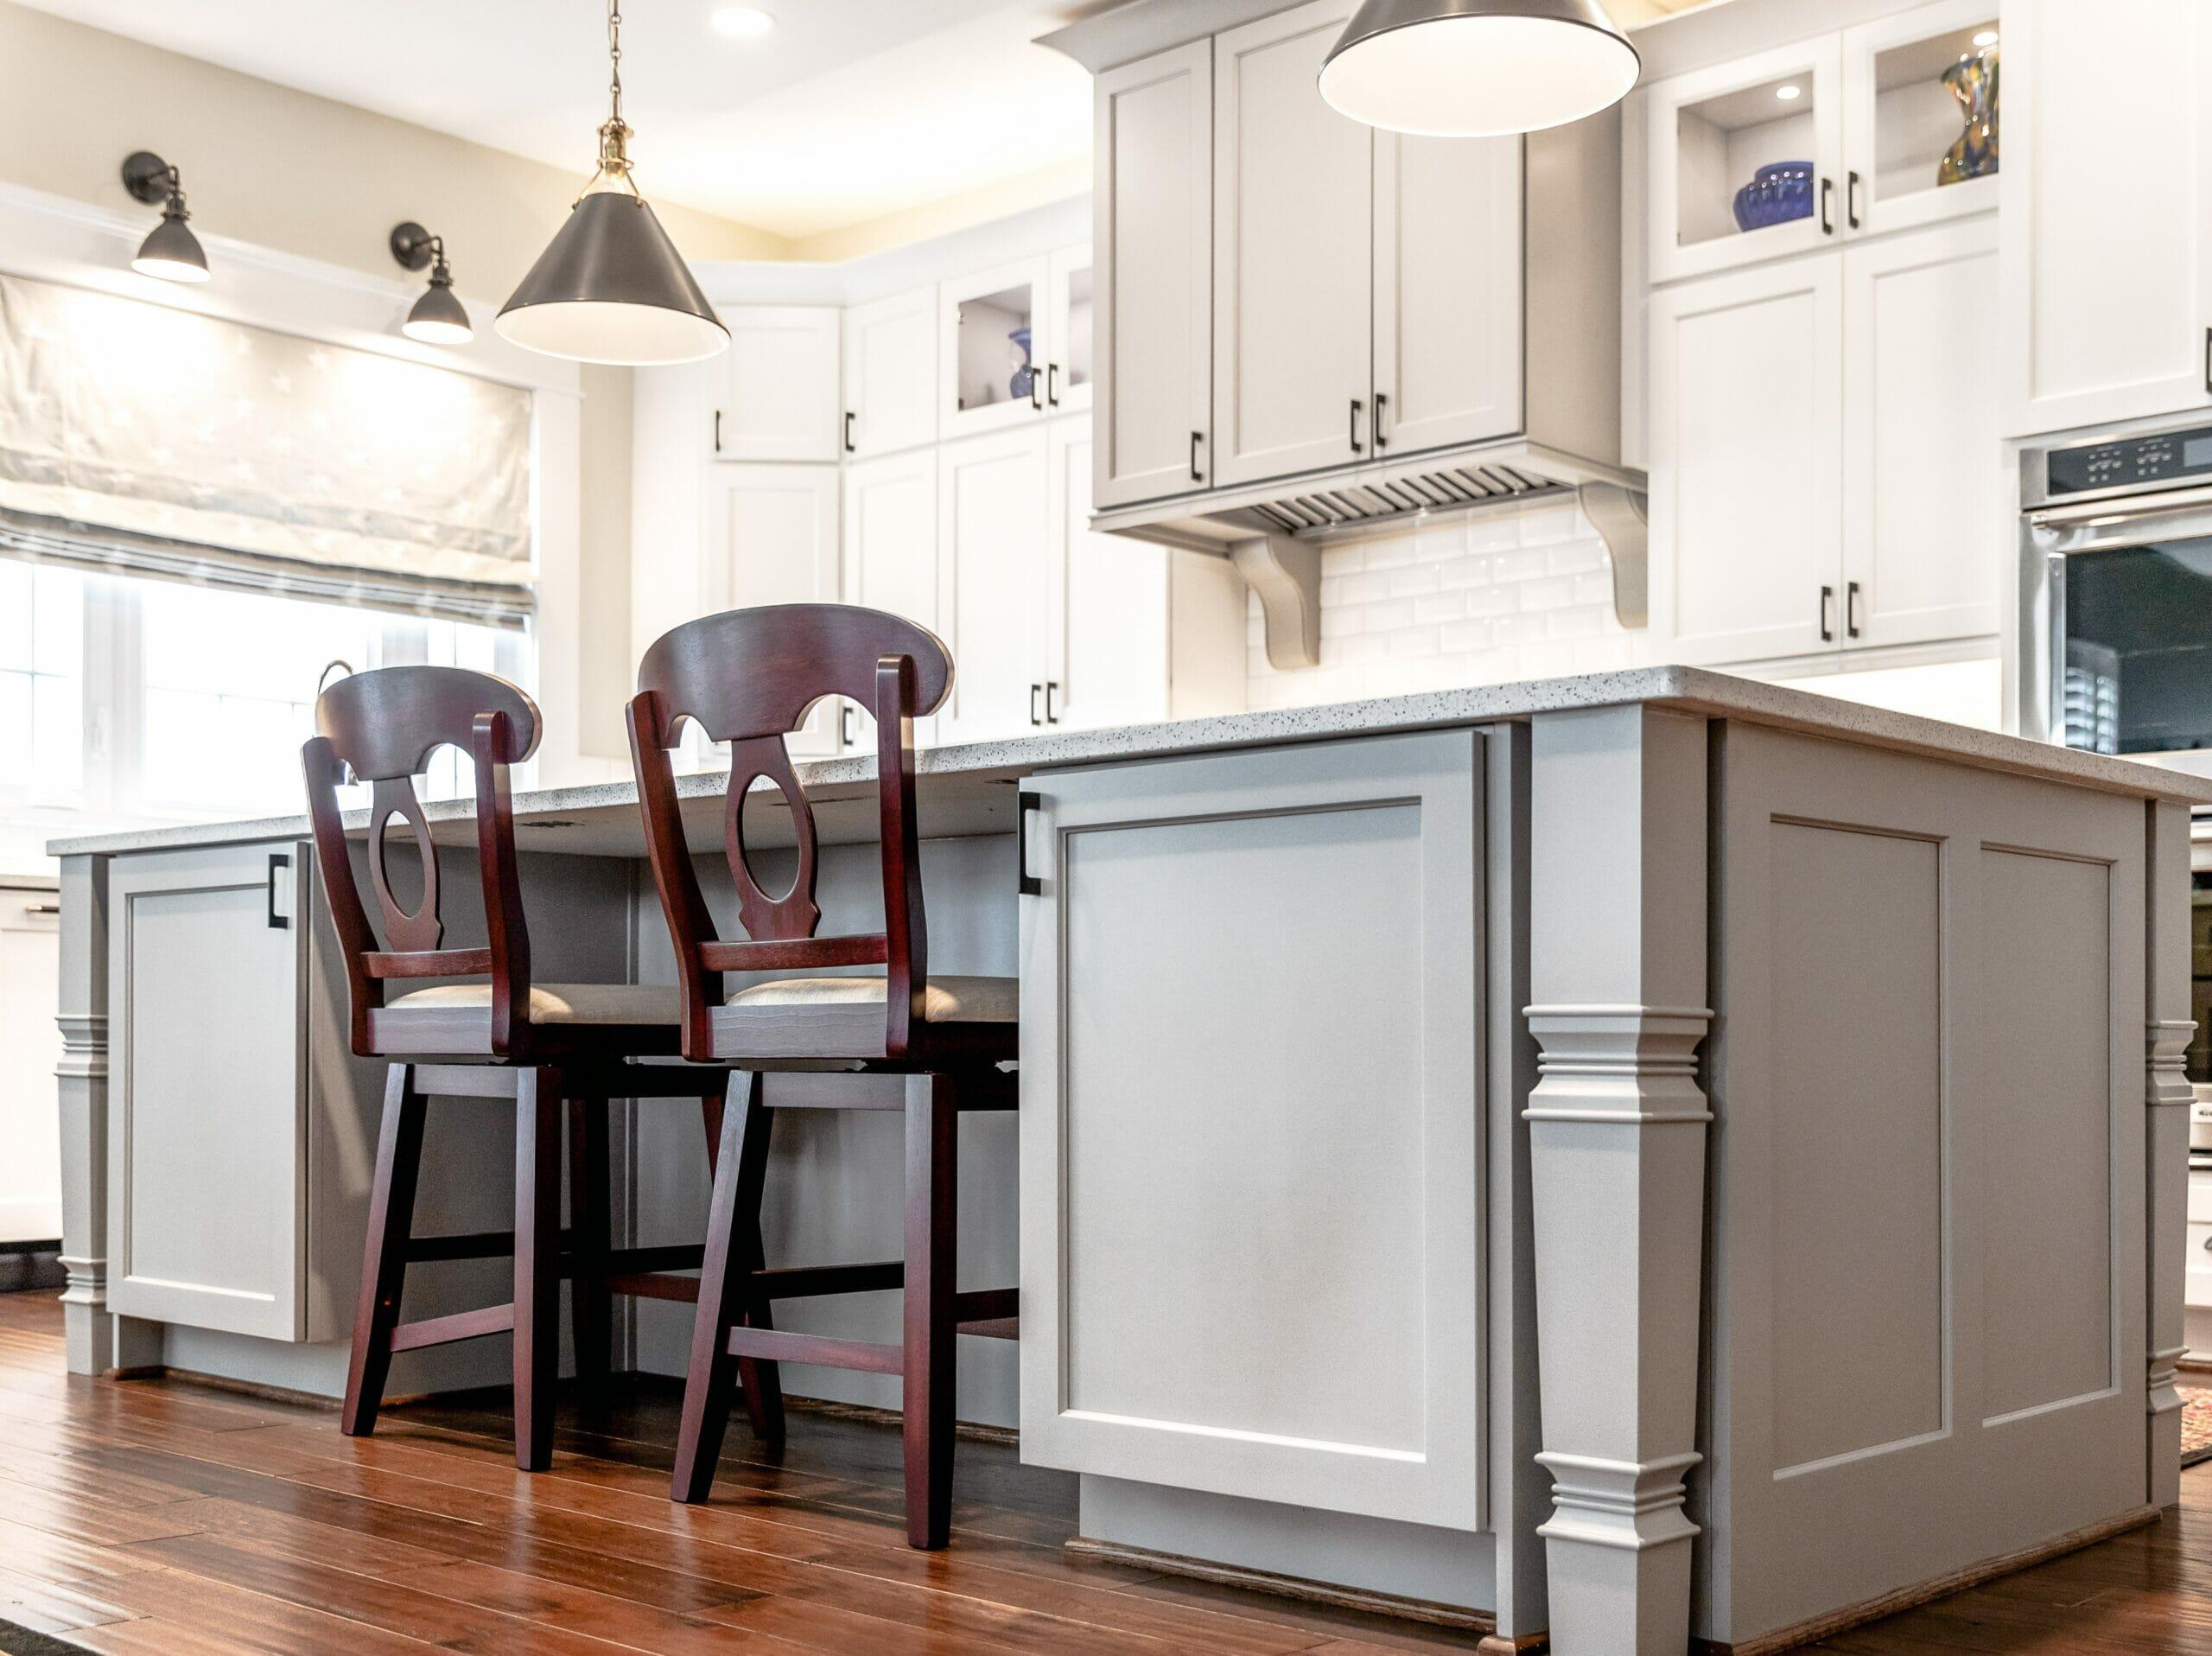 myers-kitchen-5-scaled